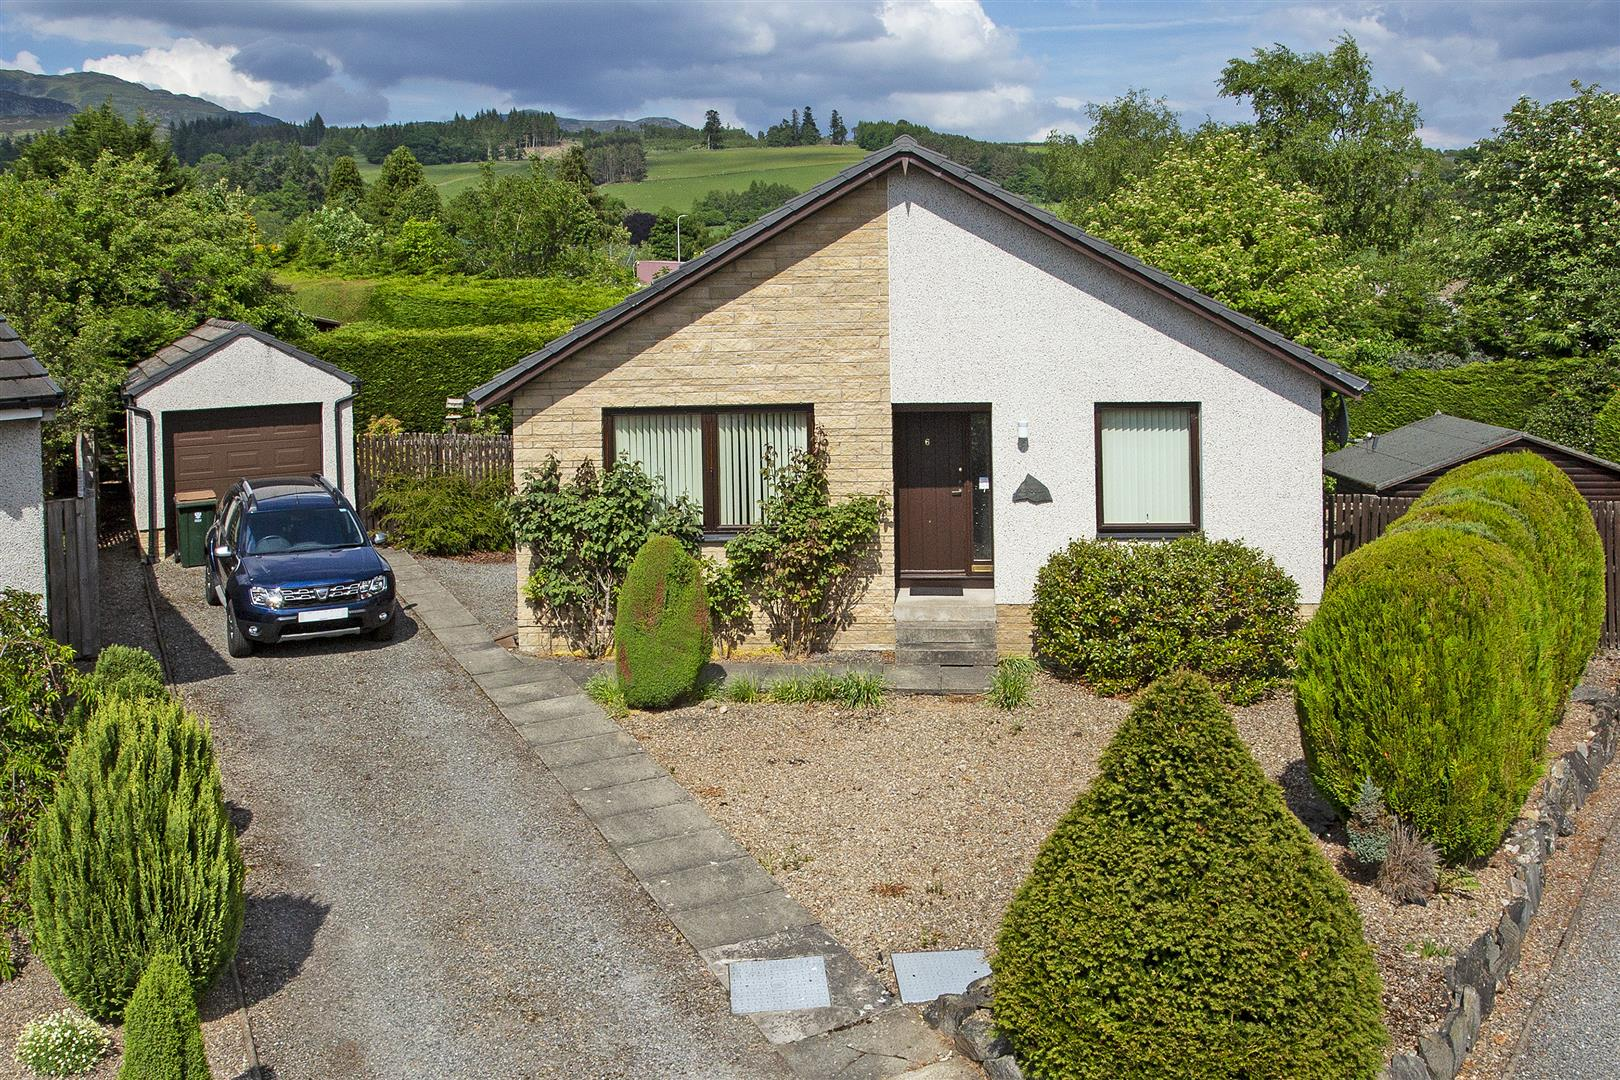 Knockard Crescent, Pitlochry, Perthshire, PH16 5JG, UK